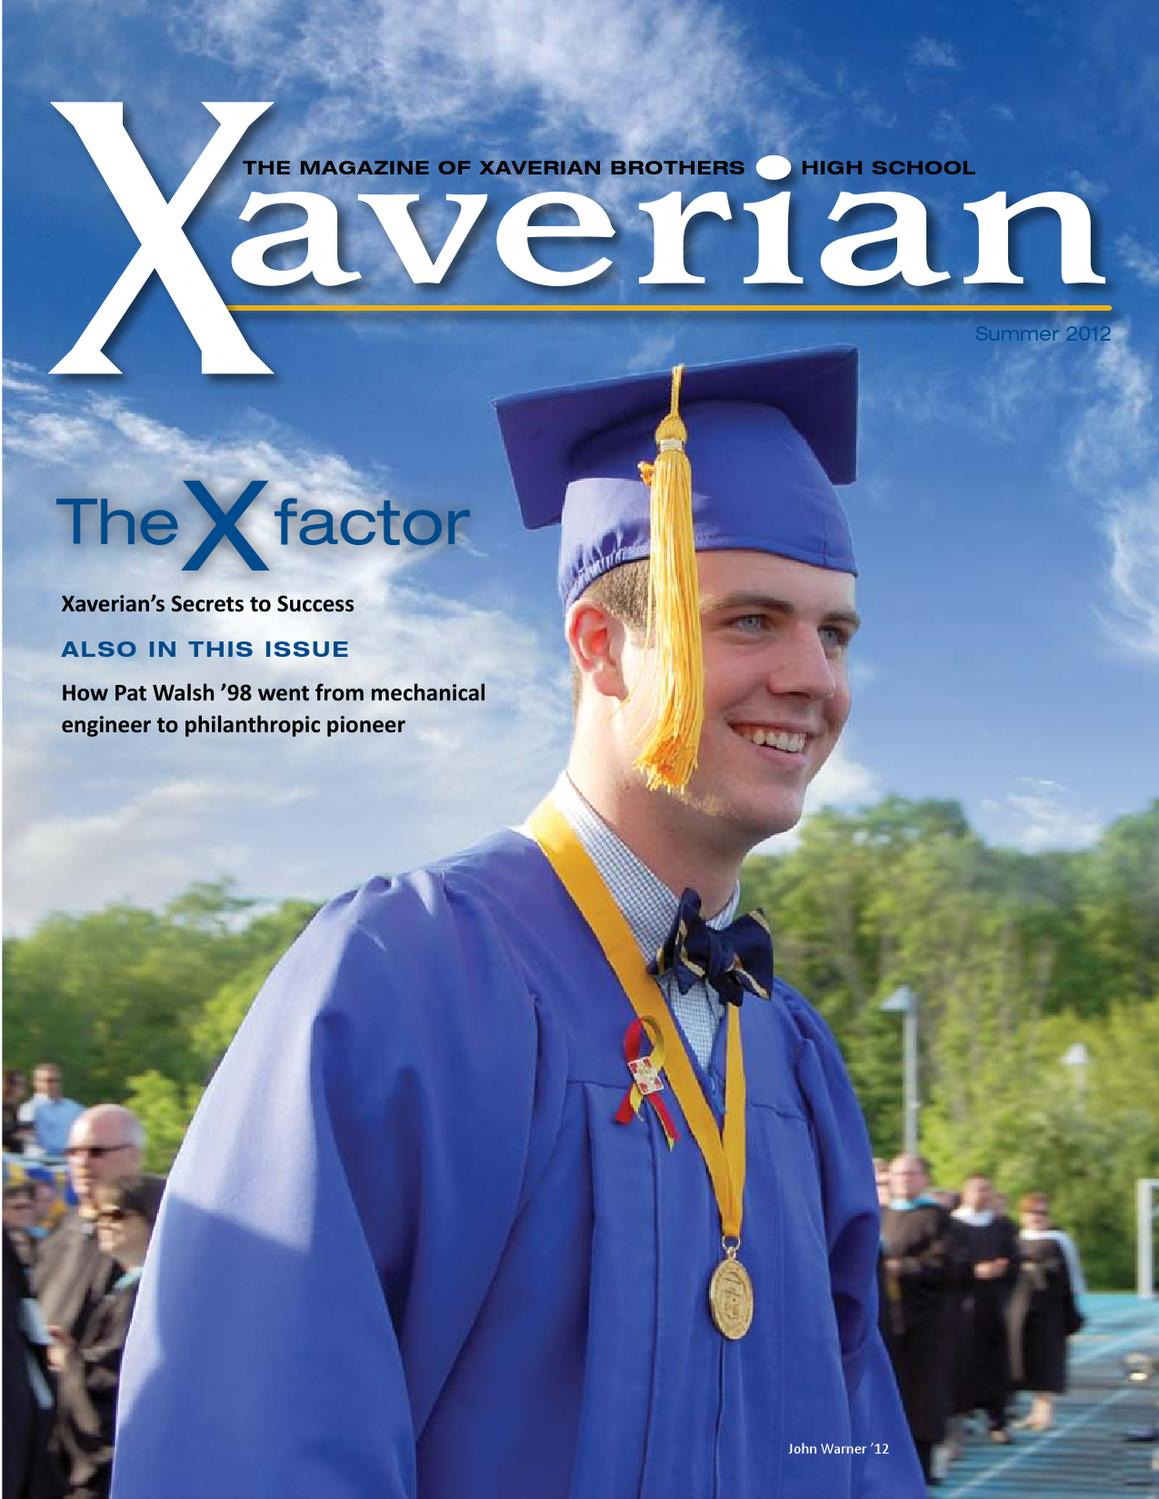 Xaverian